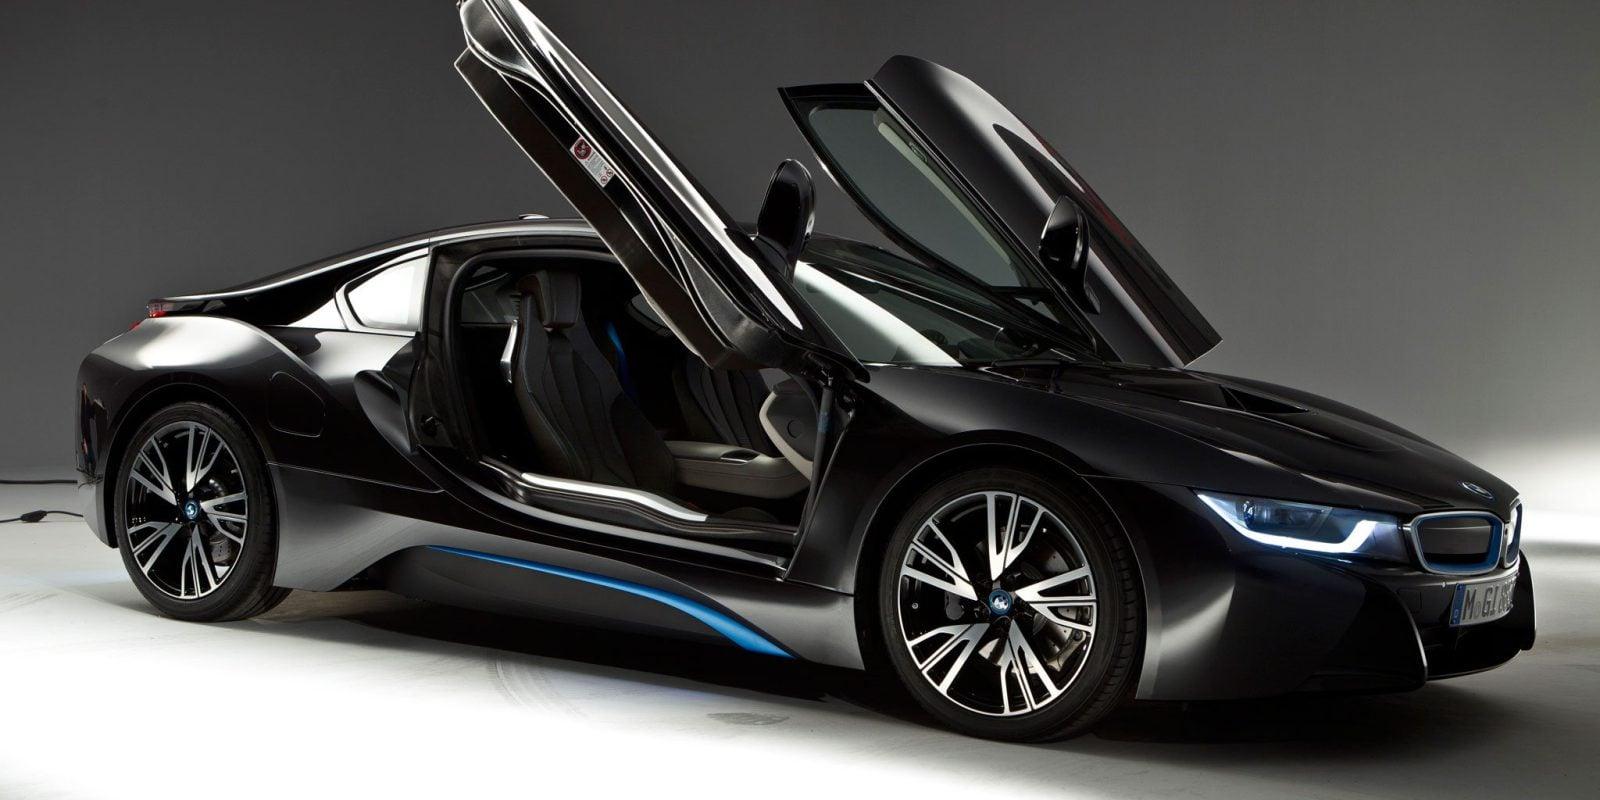 BMW i8 Modeli